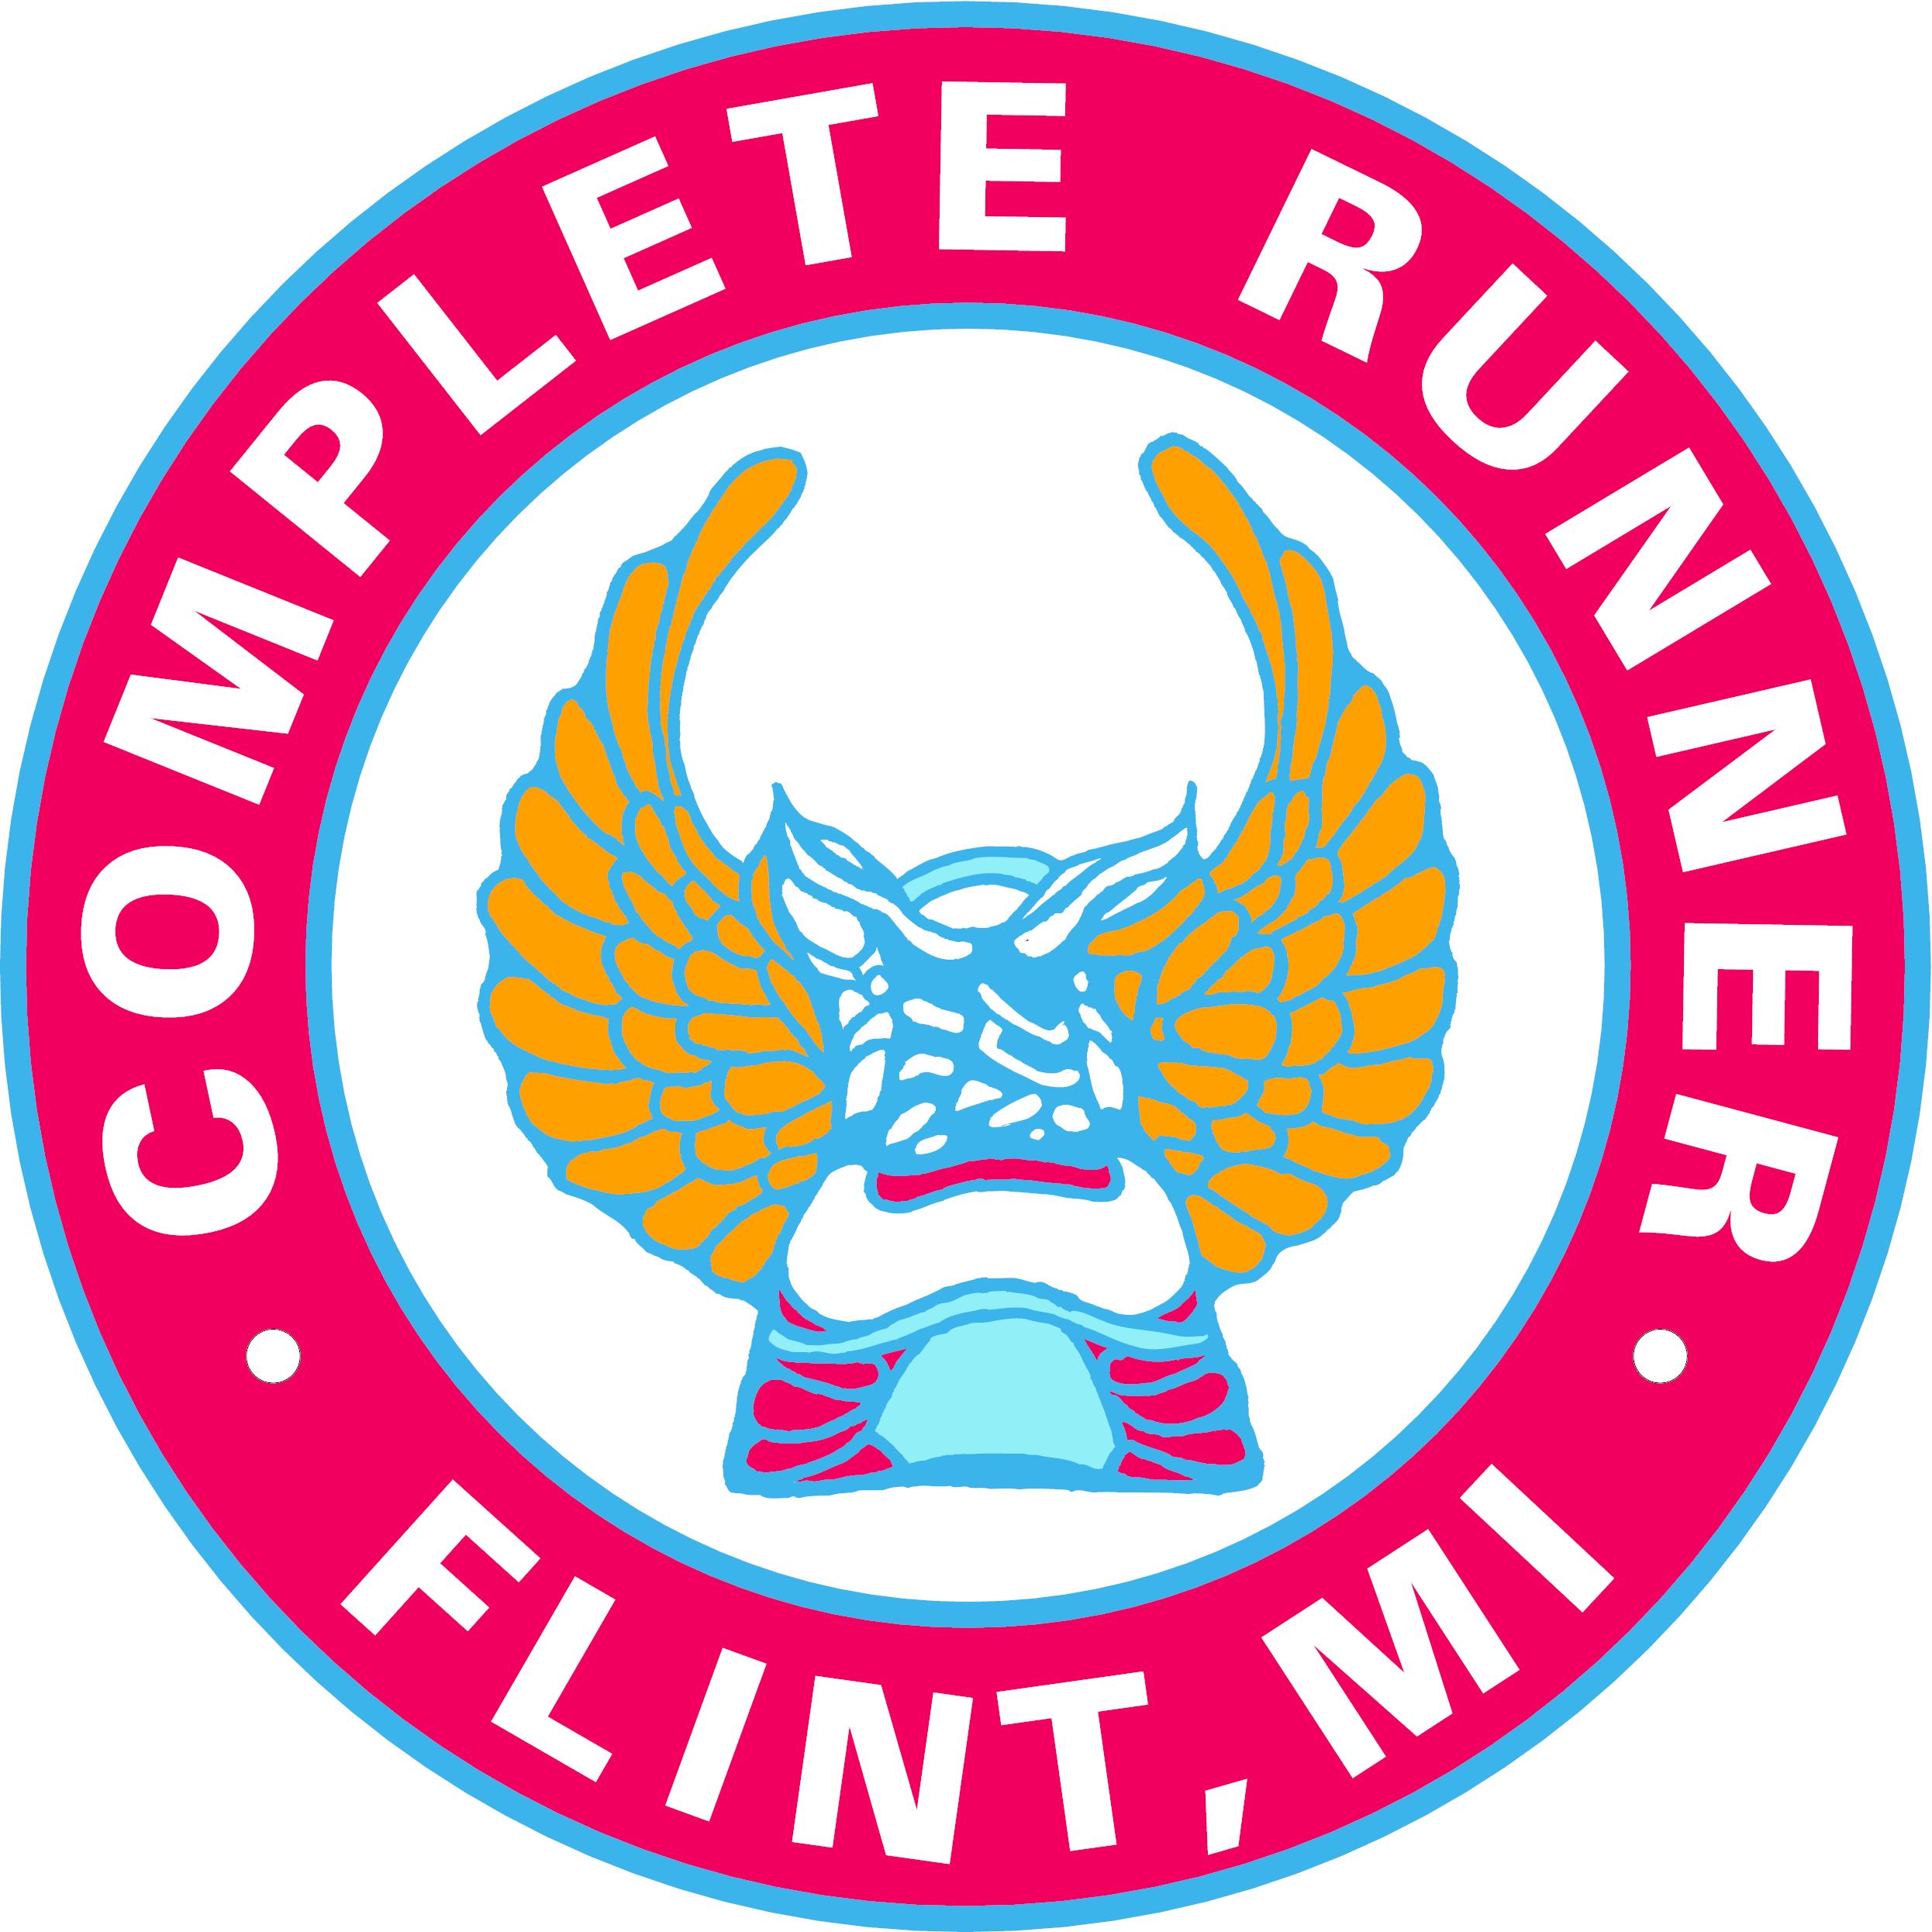 complere-runner-png-logo.png